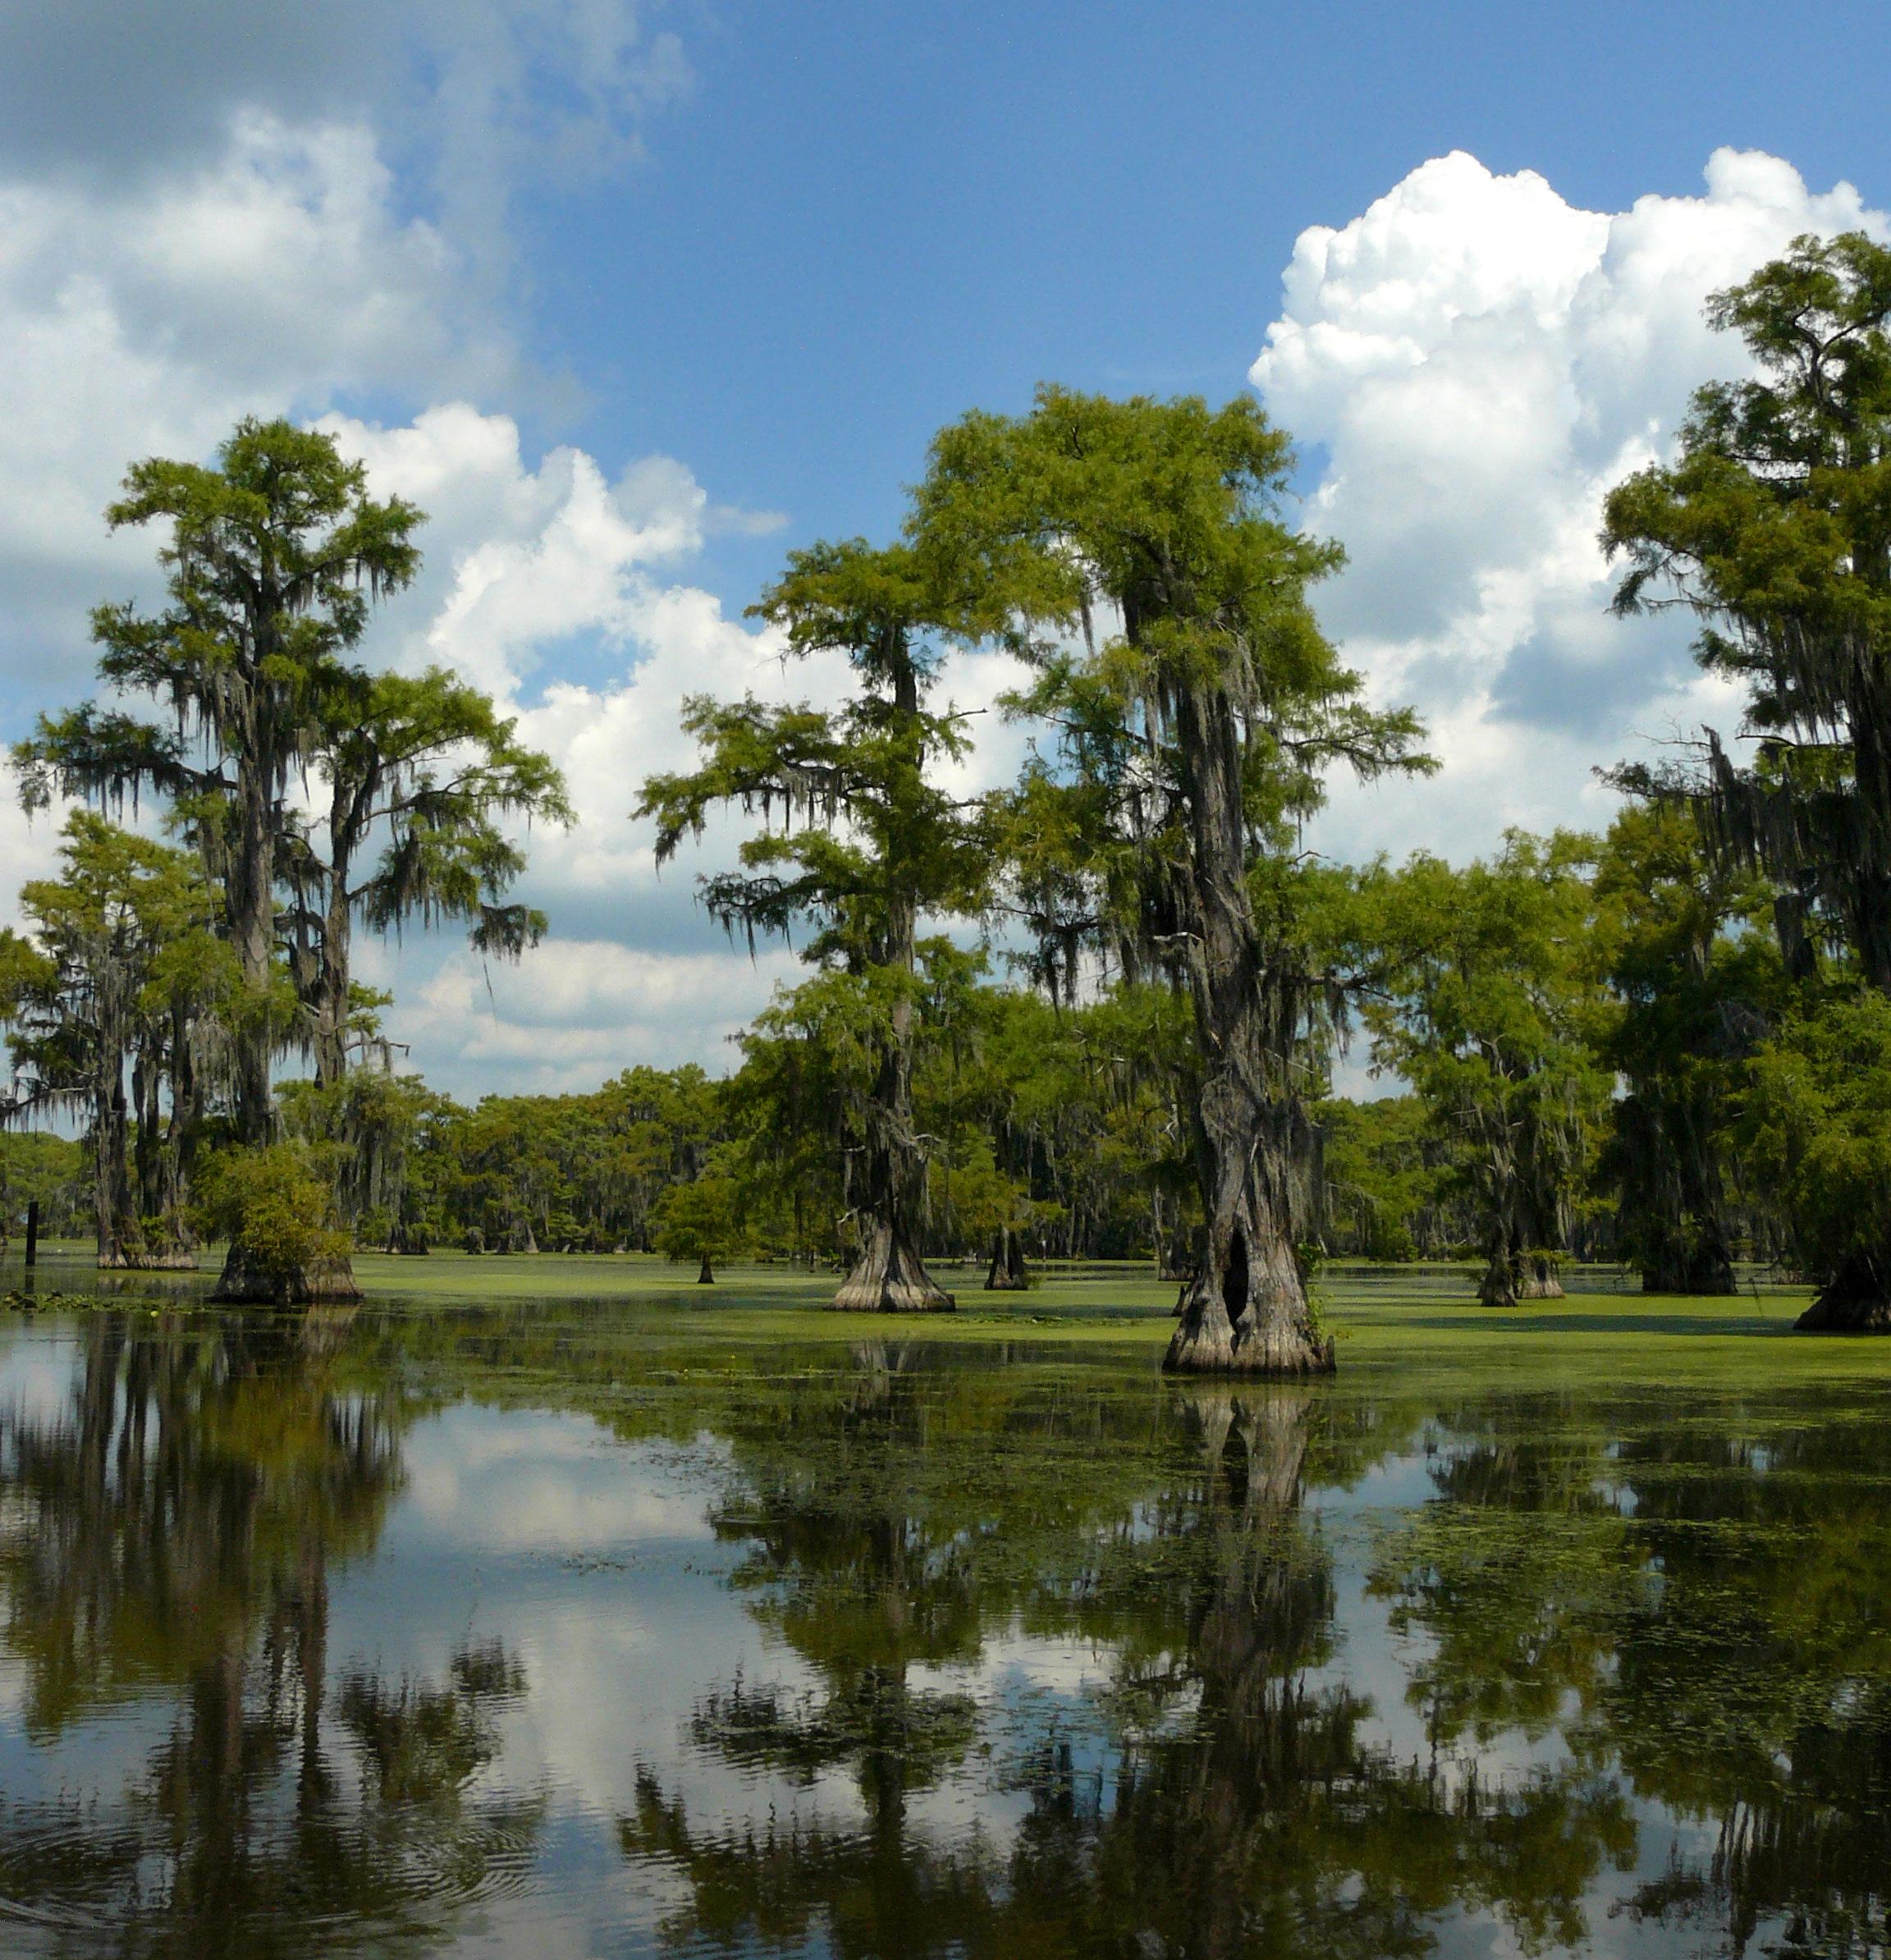 File:Taxodium distichum Caddo Lake TX 1.jpg - Wikimedia ...